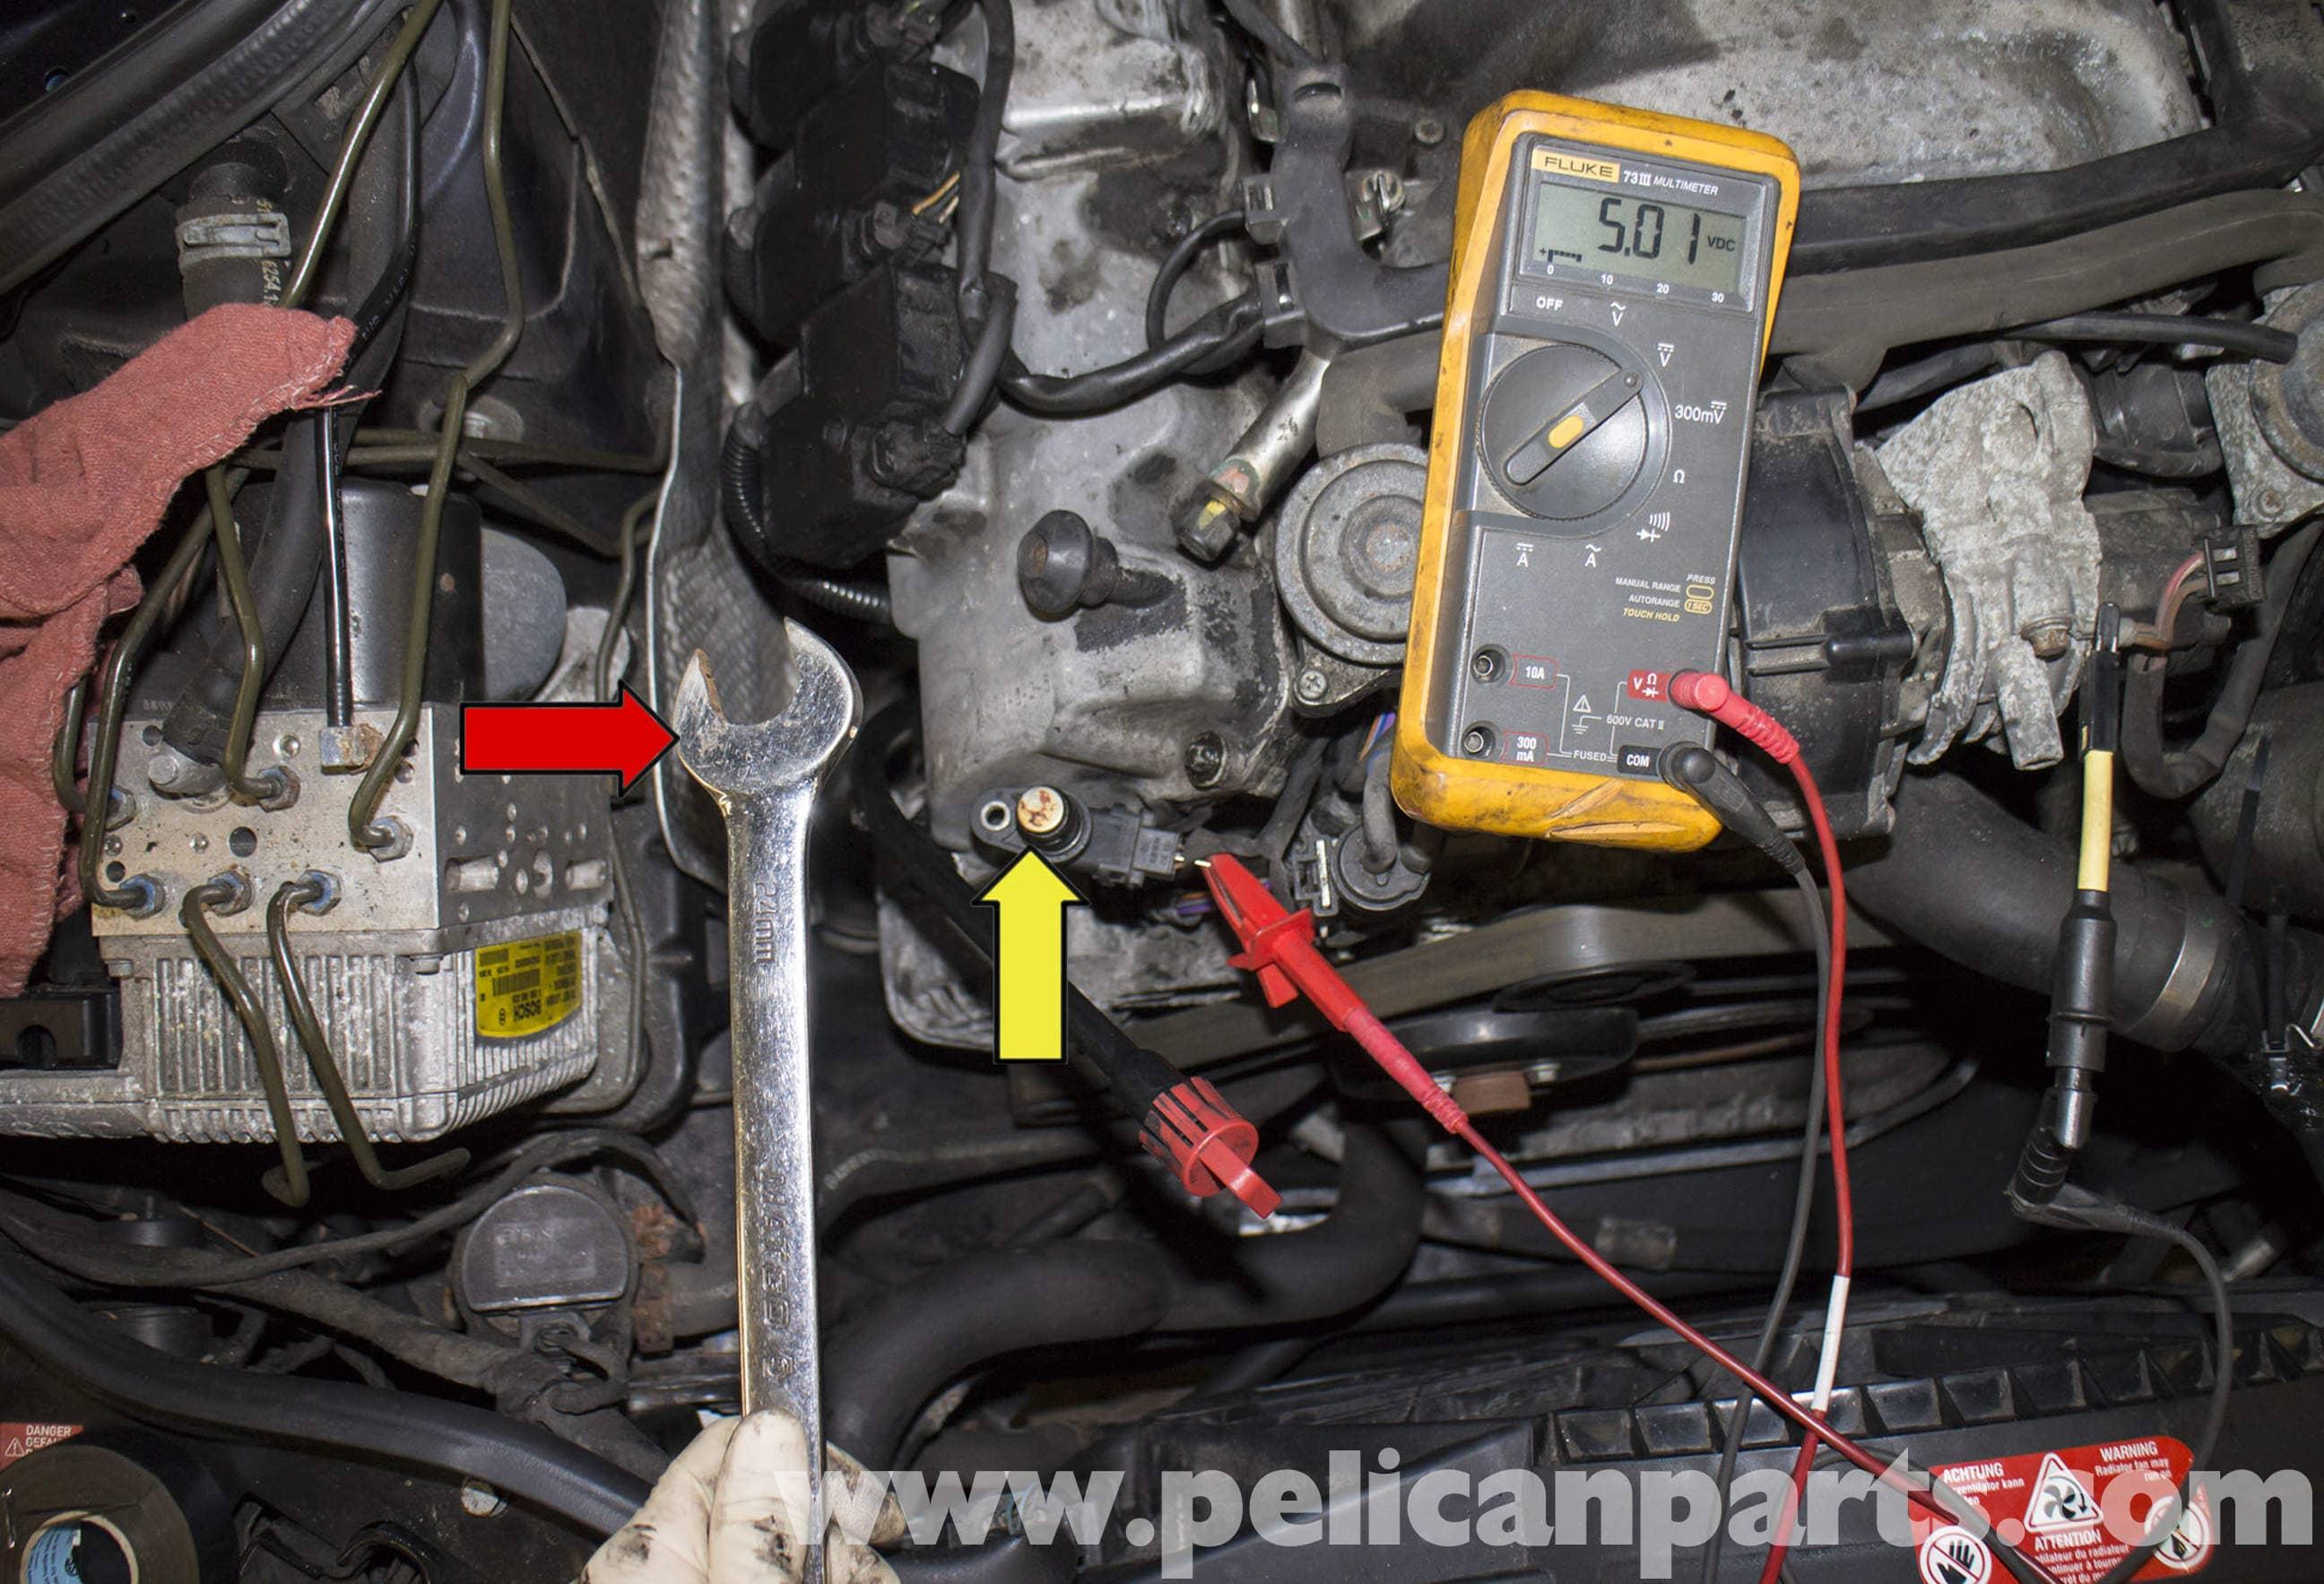 Mercedes Benz W211 Camshaft Position Sensor Testing 2003 2009 E320 Wiring Diagram Vito W638 Large Image Extra